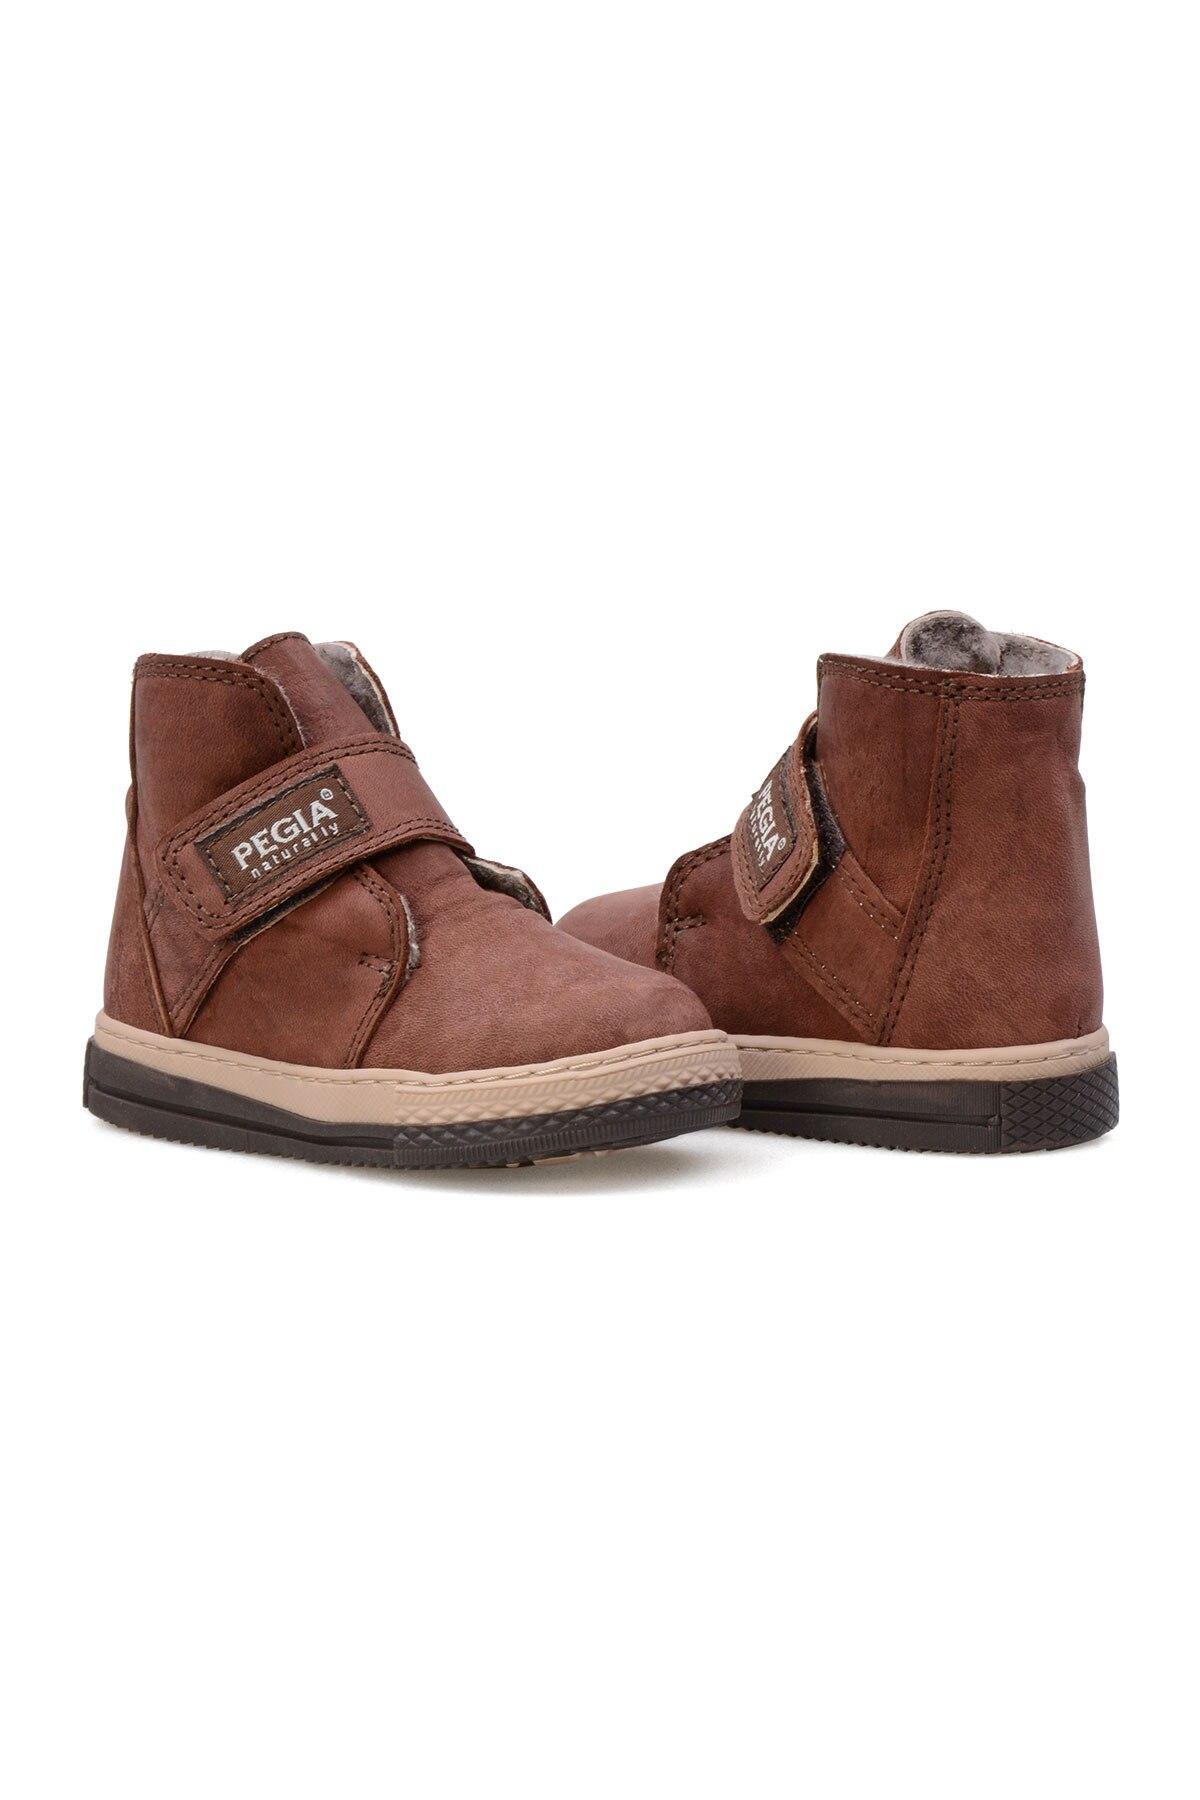 Zapatos de piel de oveja para niños, zapatos para niñas